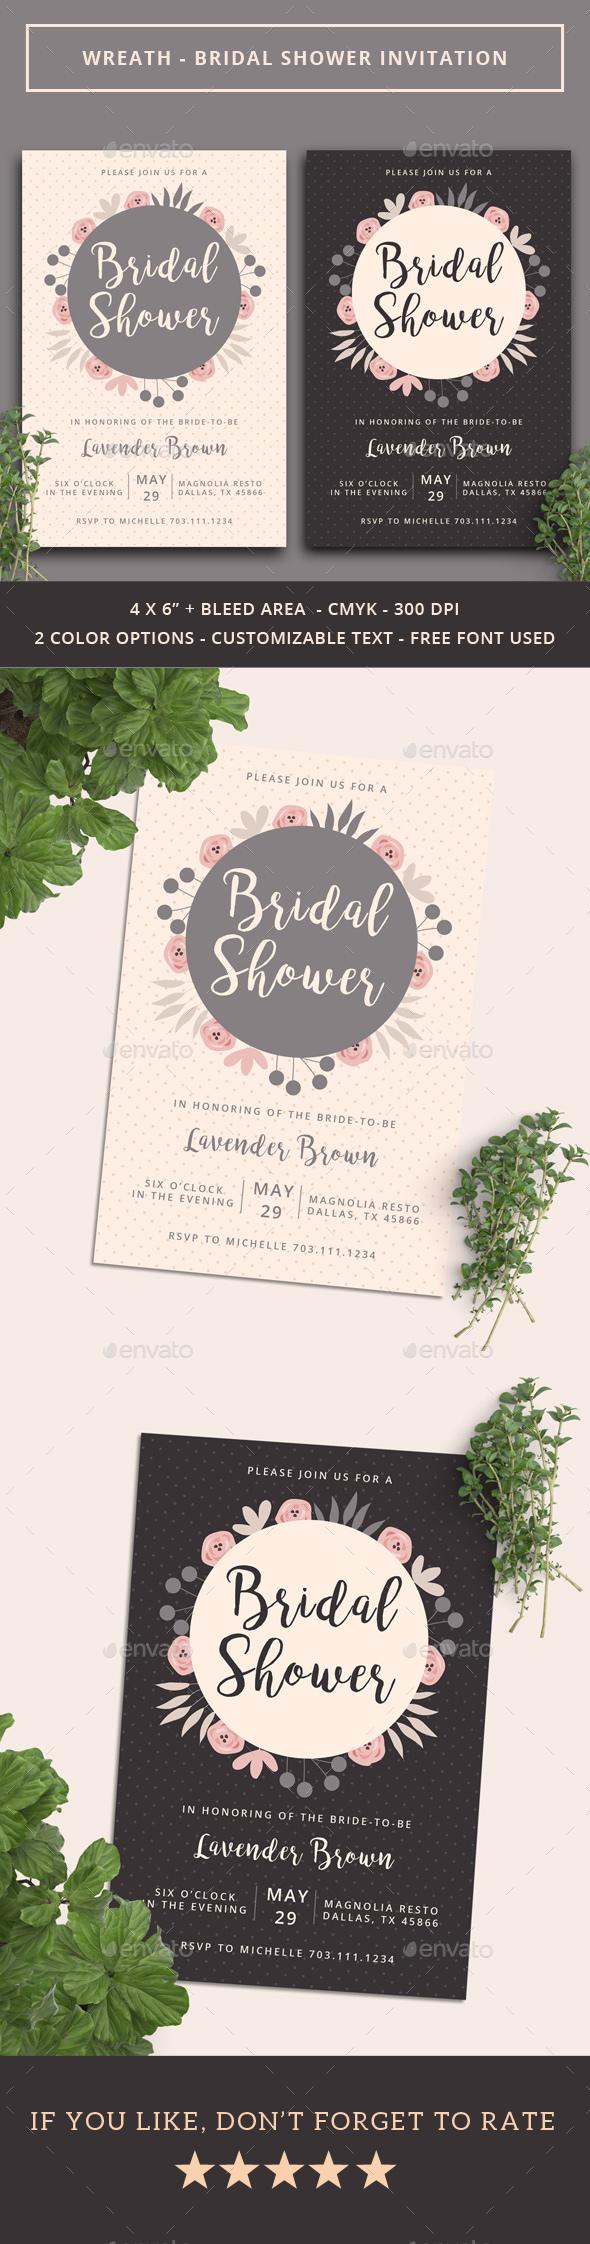 Wreath - Bridal Shower Invitation - Weddings Cards & Invites